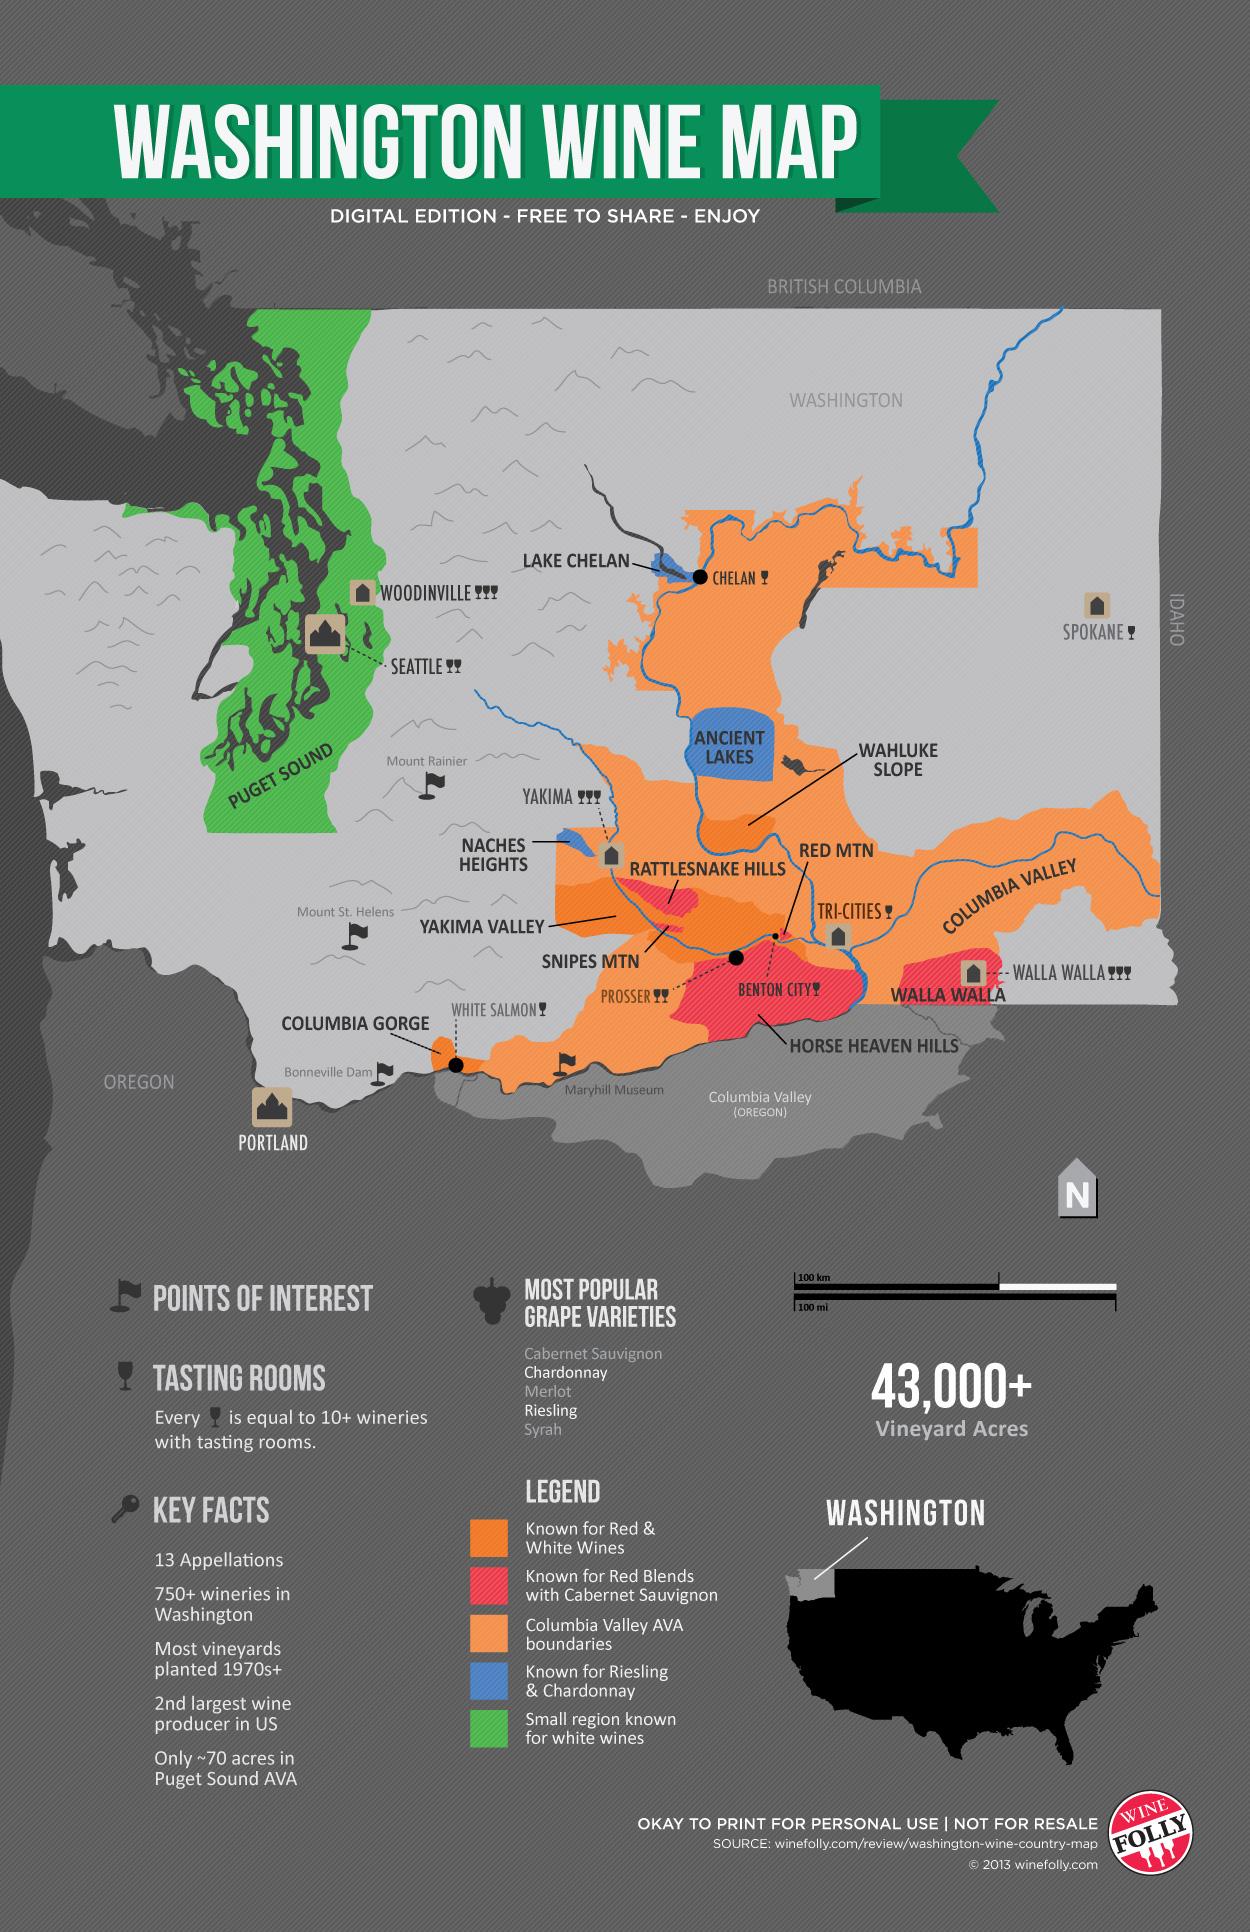 Washington-wine-map-wine-folly.jpg